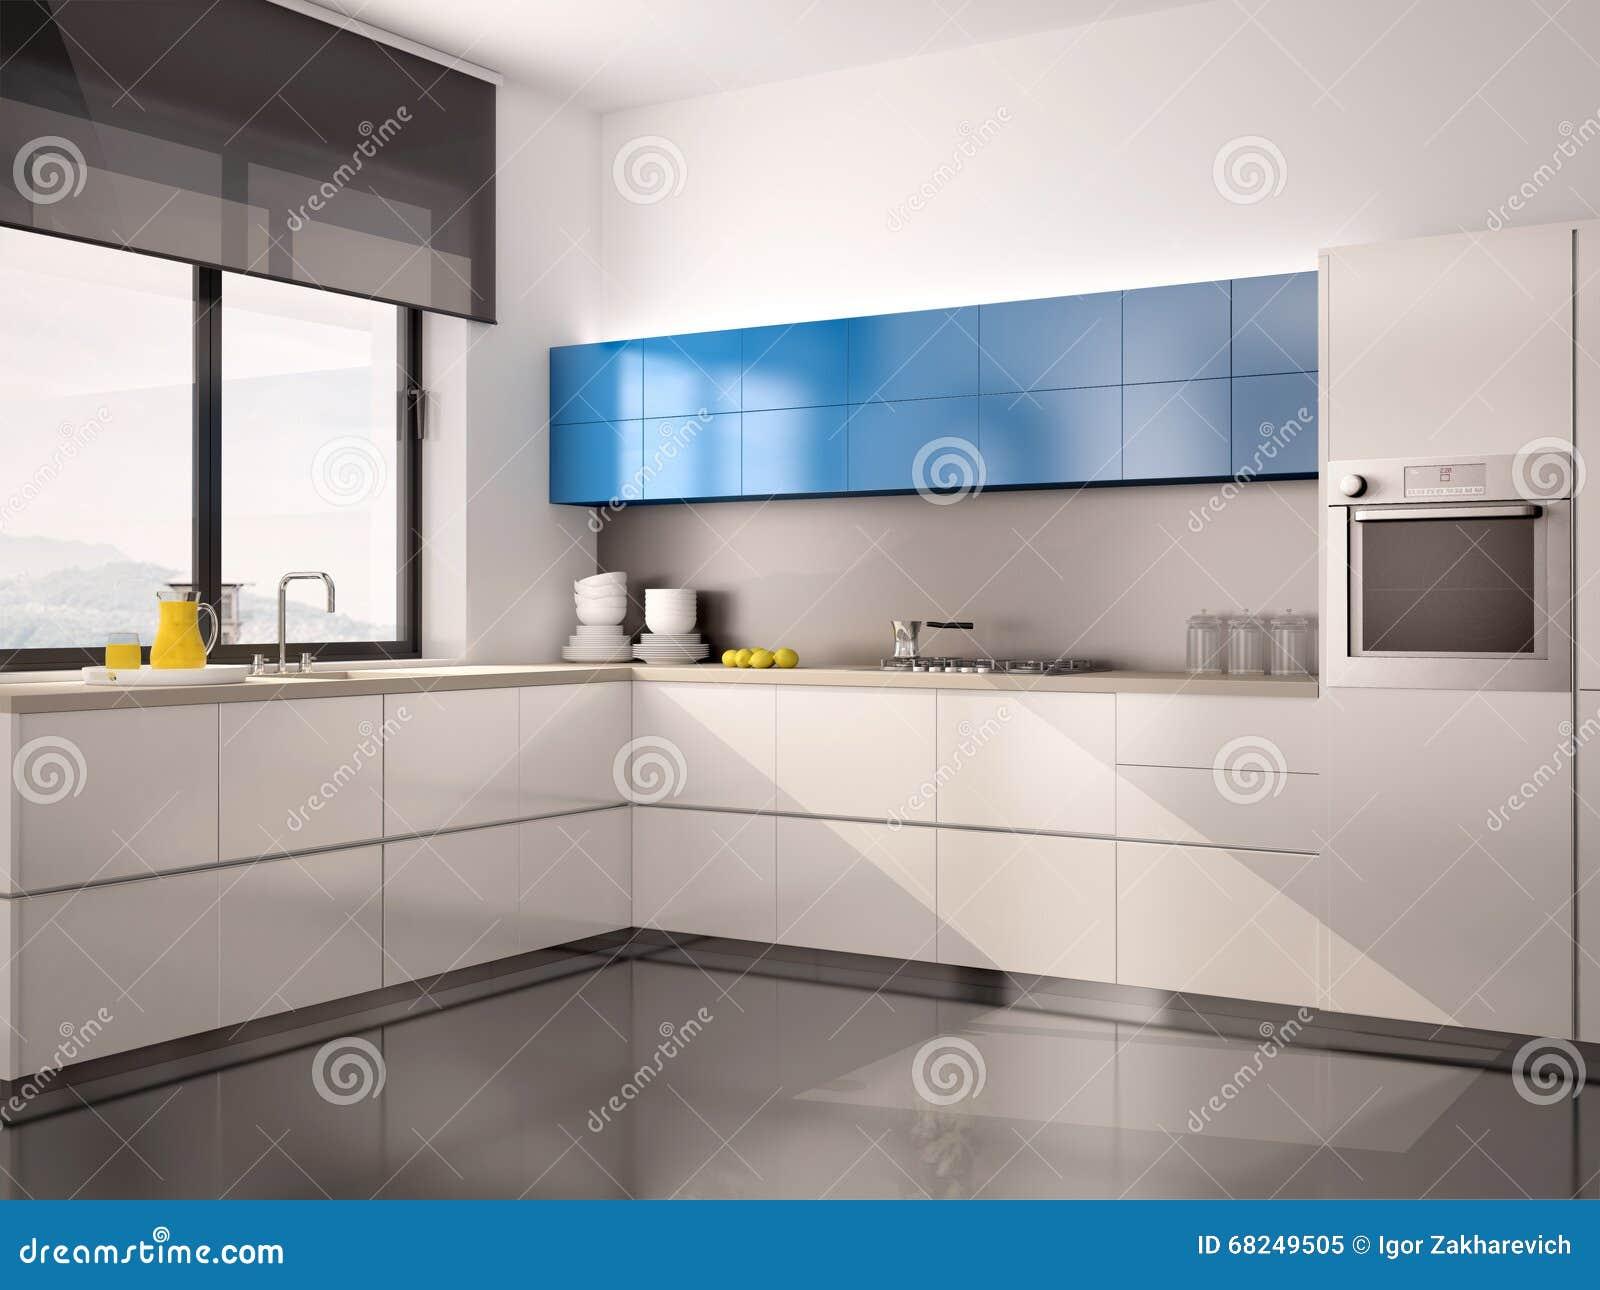 Cocinas Modernas Blancas Y Grises Fabulous Cocina En Blanco Y  ~ Cocinas Modernas Blancas Y Grises